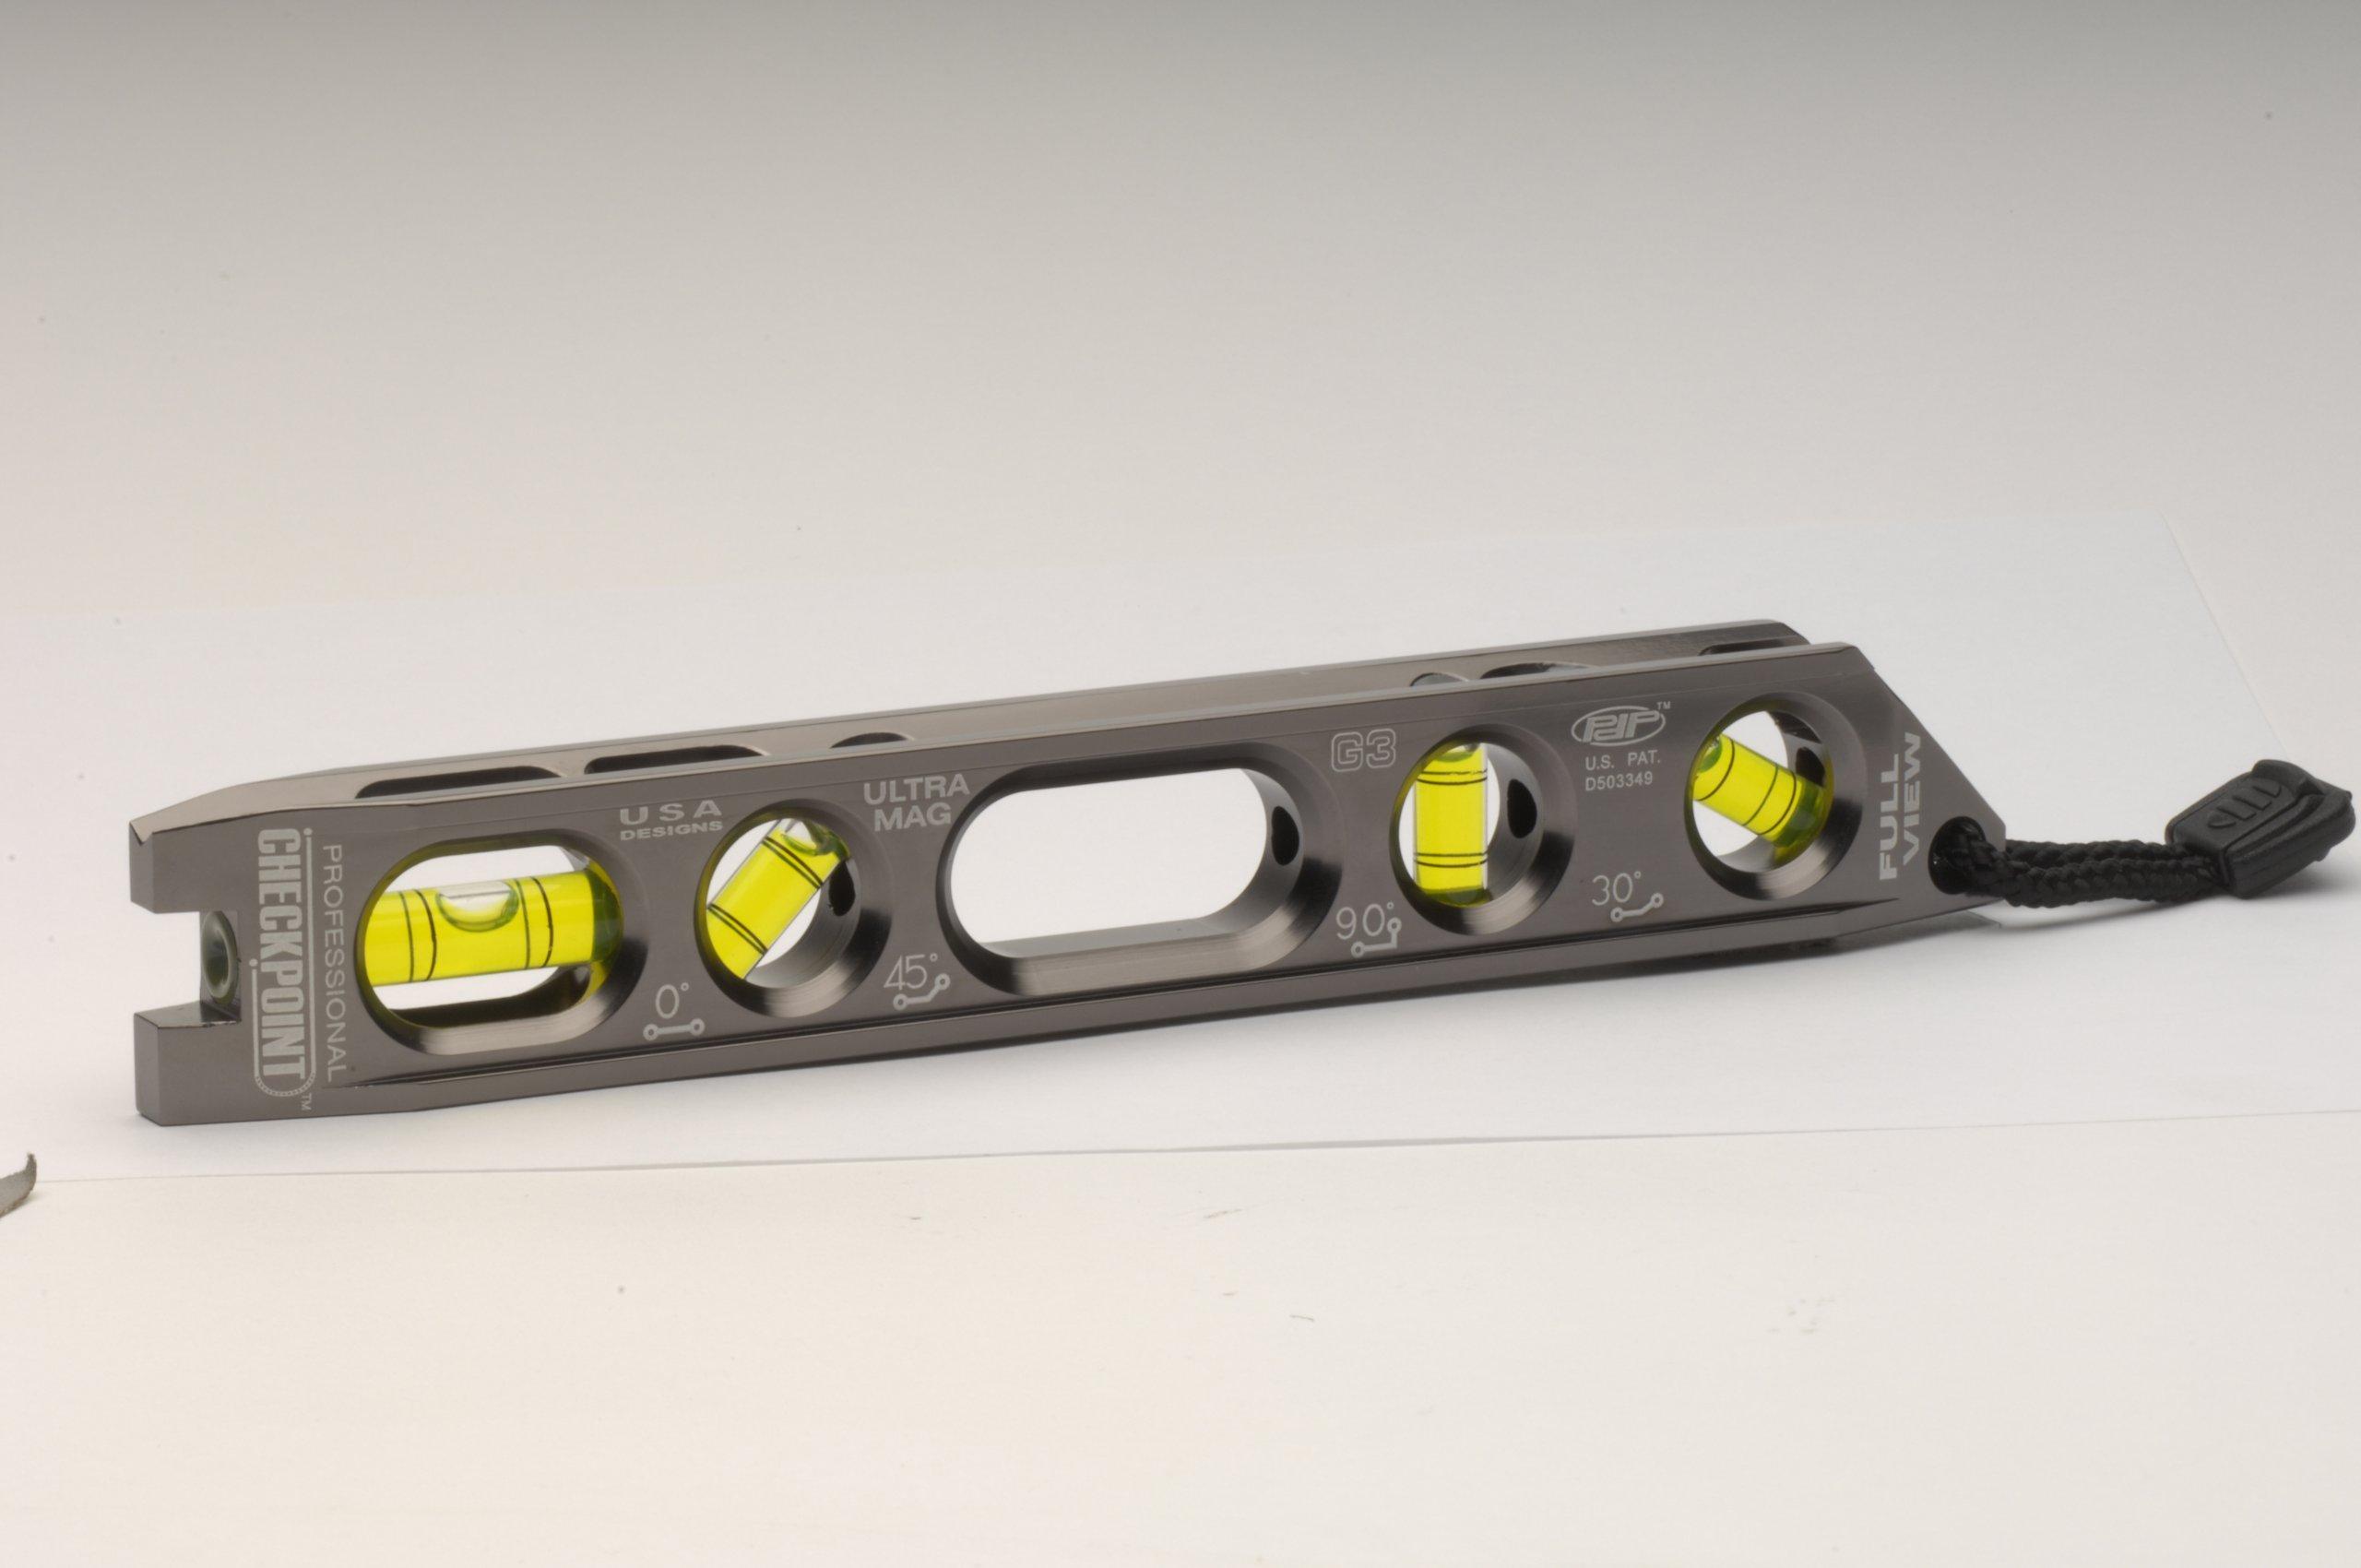 CHECKPOINT 0300PL Pro Mag Precision Torpedo Level, Platinum